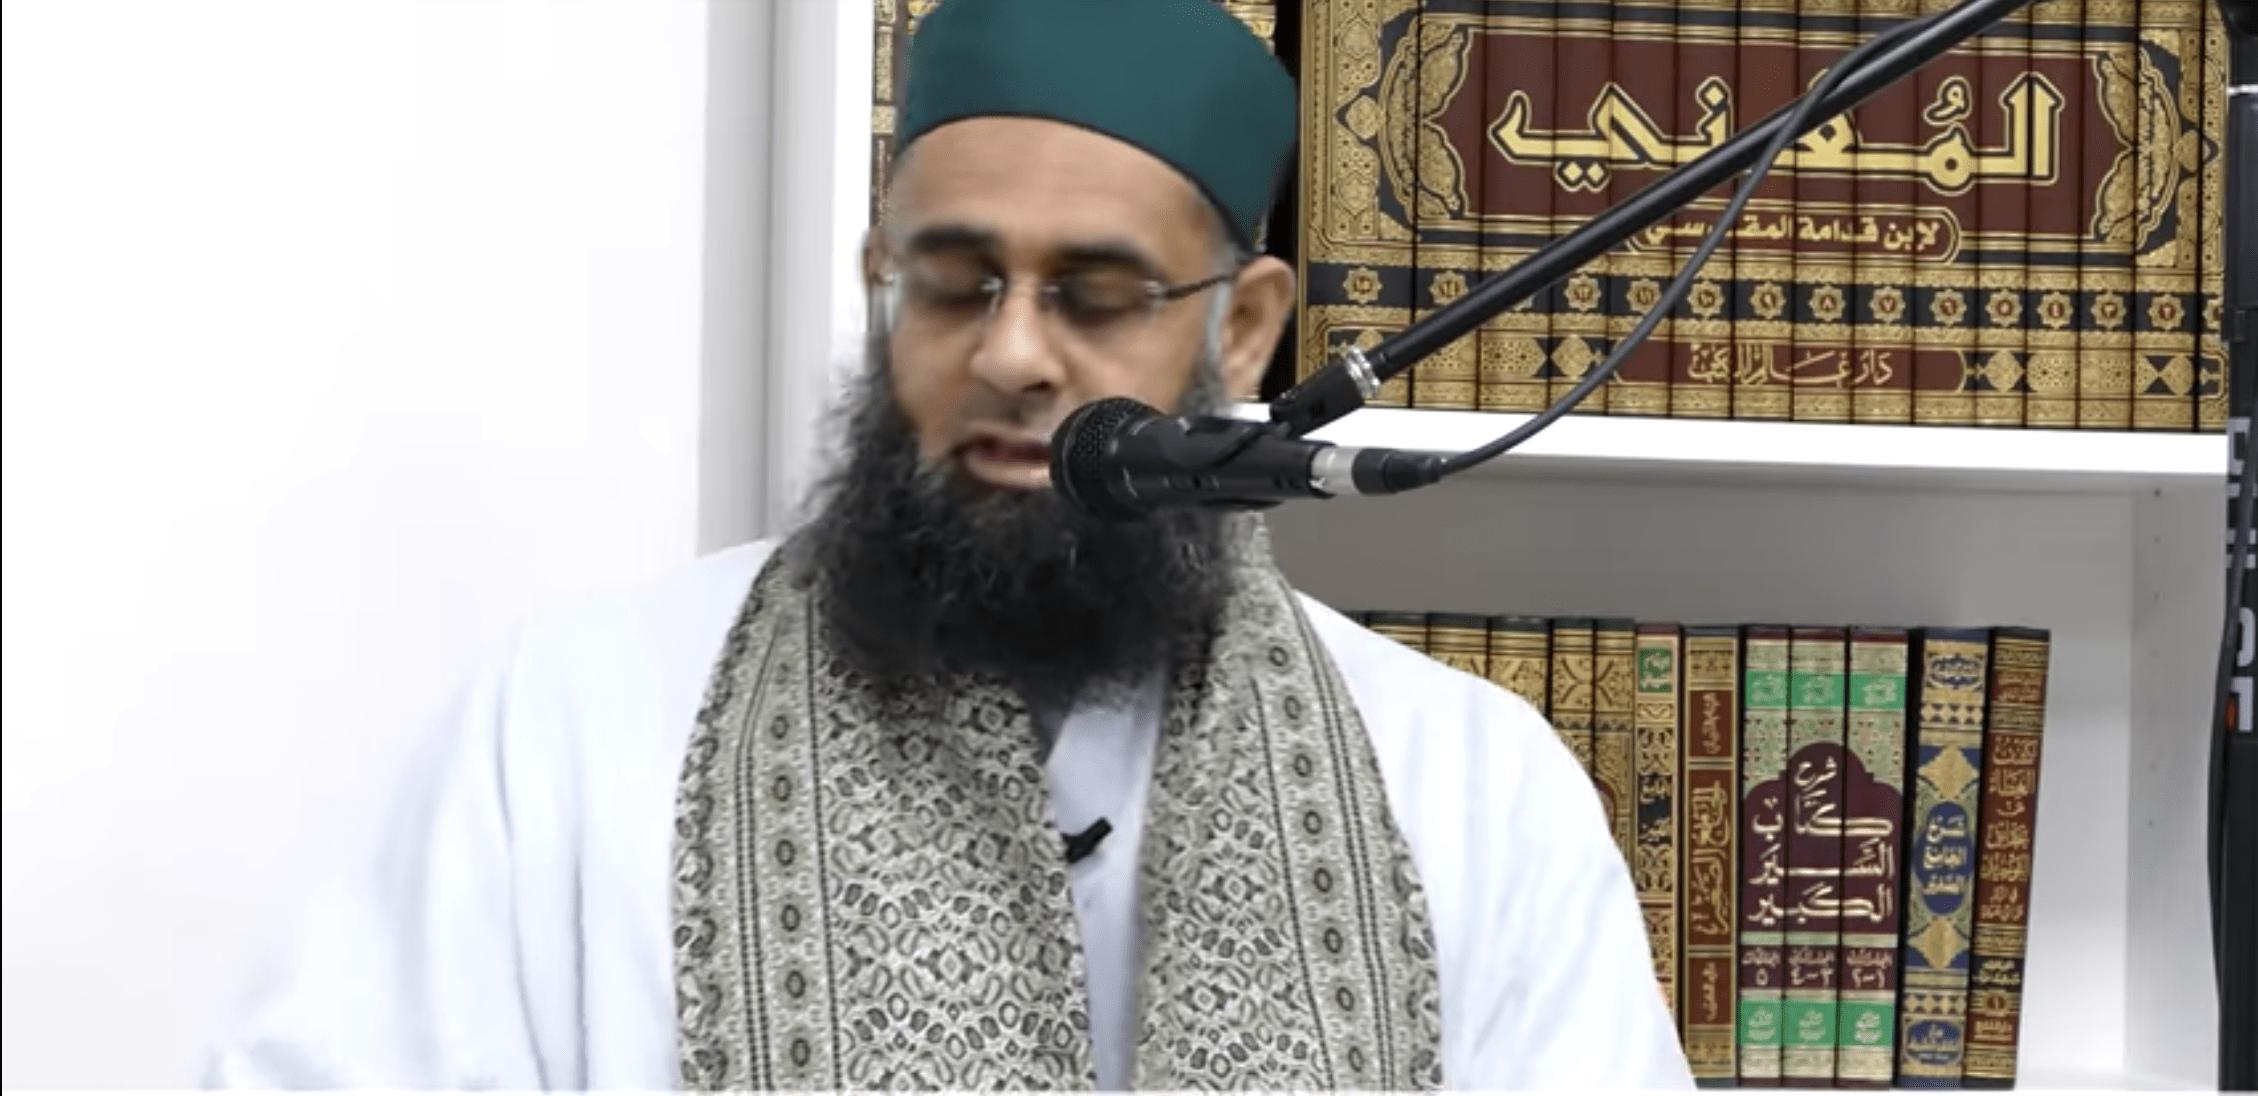 Abdur-Rahman ibn Yusuf – Imam Ahmad ibn Hanbal and the Criminal's Advice